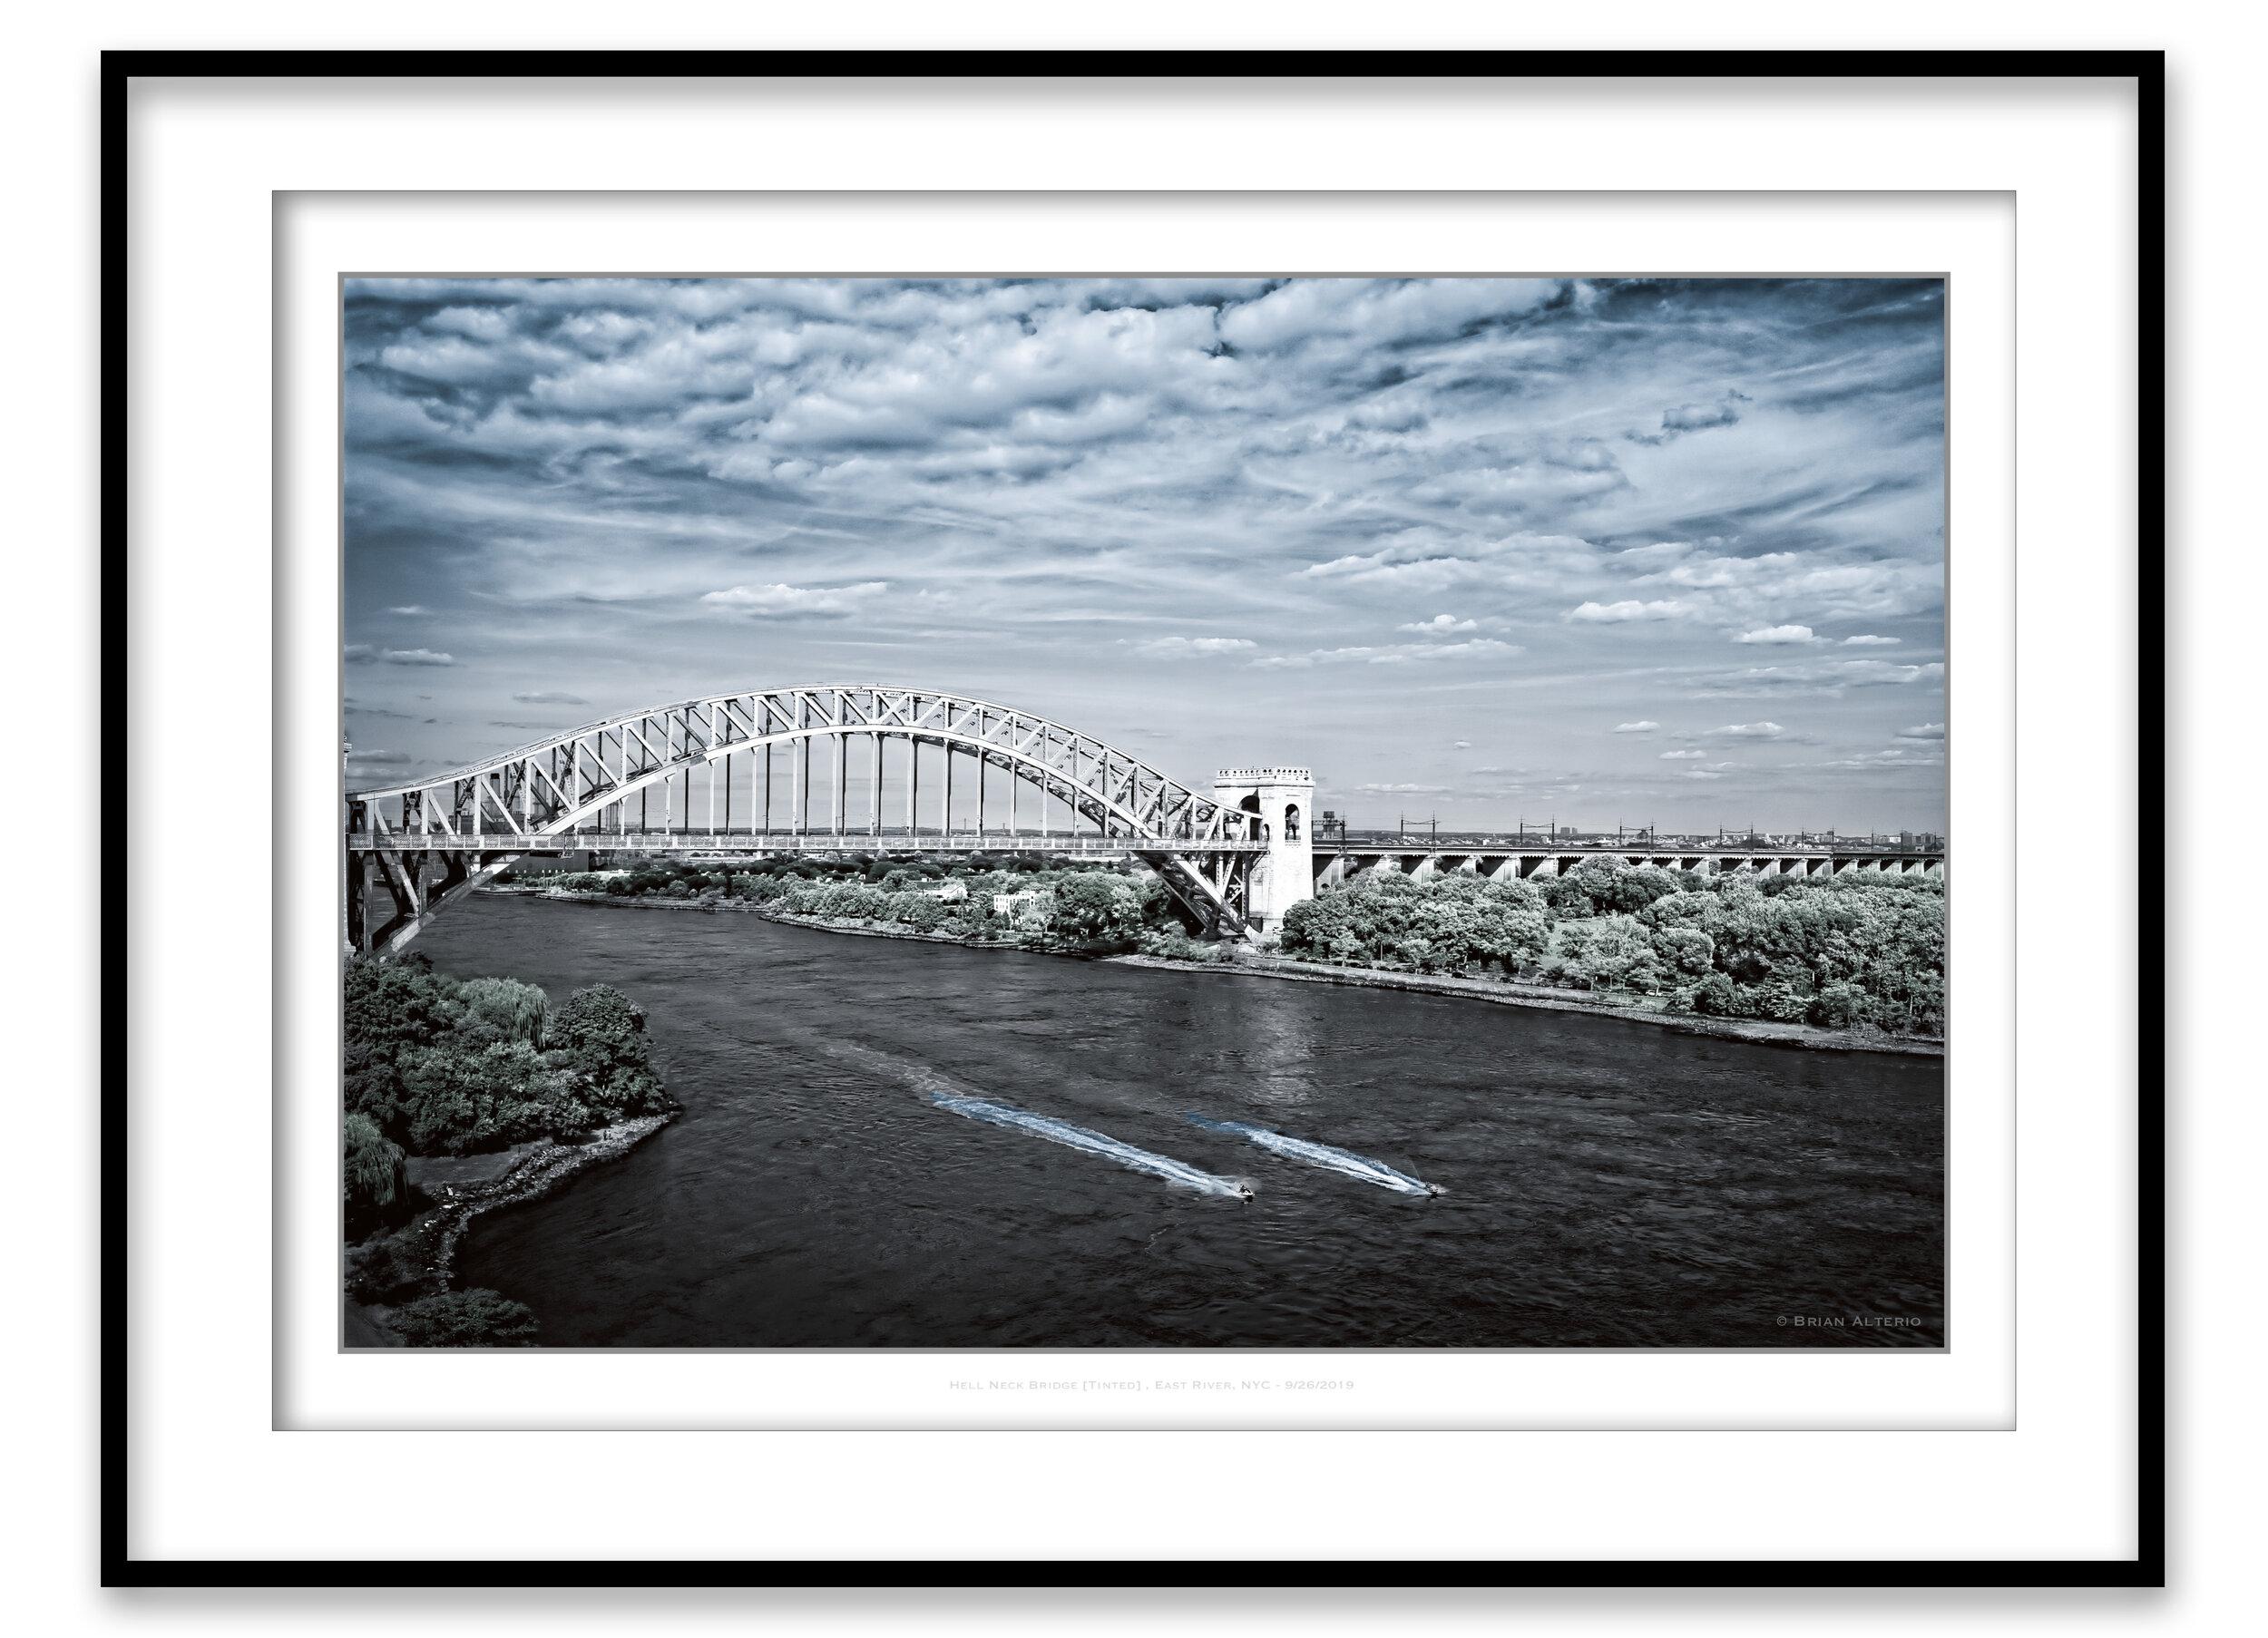 Hell Neck Bridge [Tinted] , East River, NYC - 9-26-2019 Framed.jpg